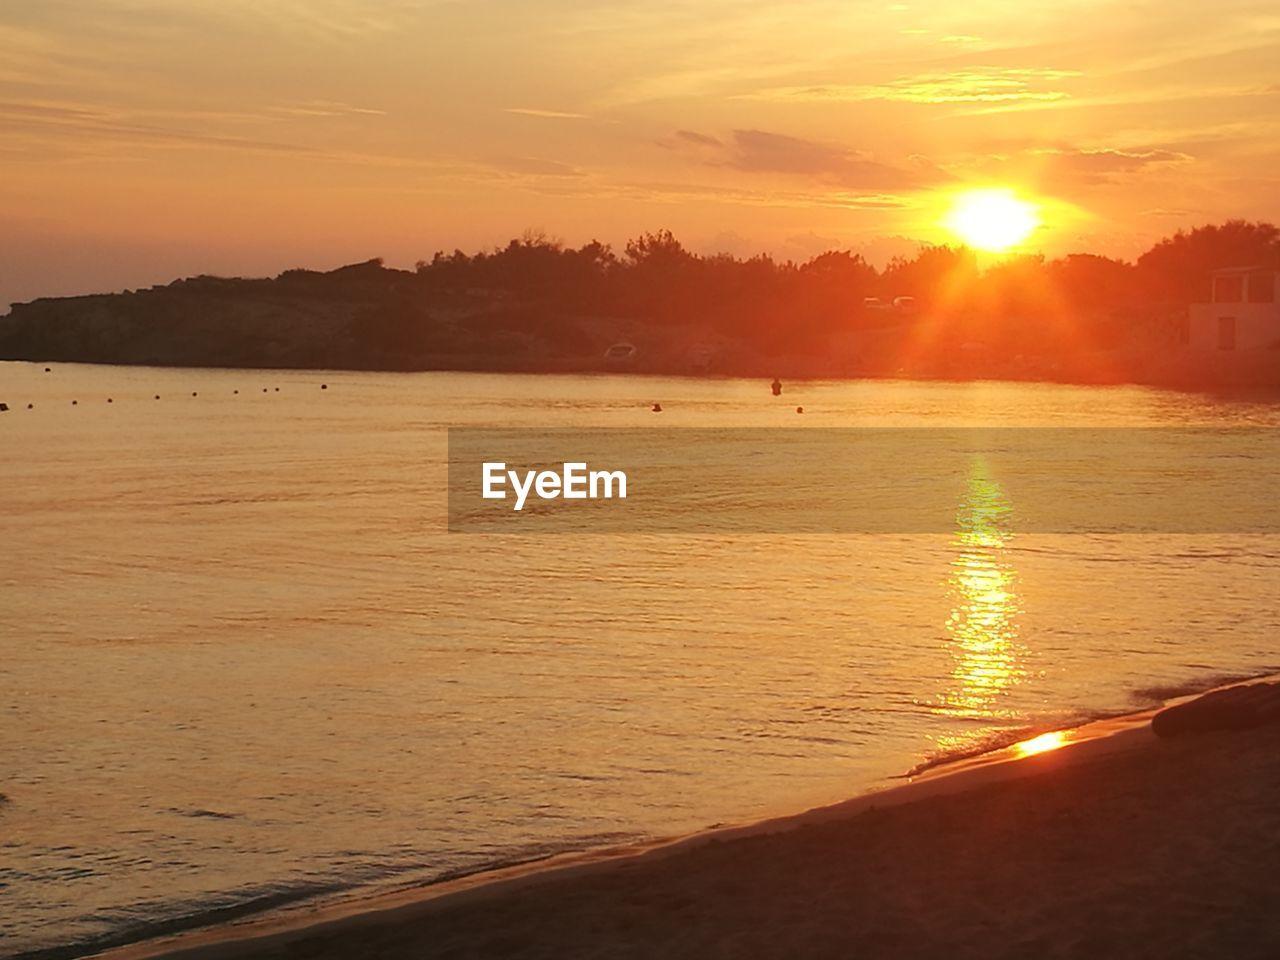 sunset, sky, water, beauty in nature, scenics - nature, orange color, sea, sun, land, beach, tranquility, nature, sunlight, tranquil scene, idyllic, silhouette, non-urban scene, sport, cloud - sky, outdoors